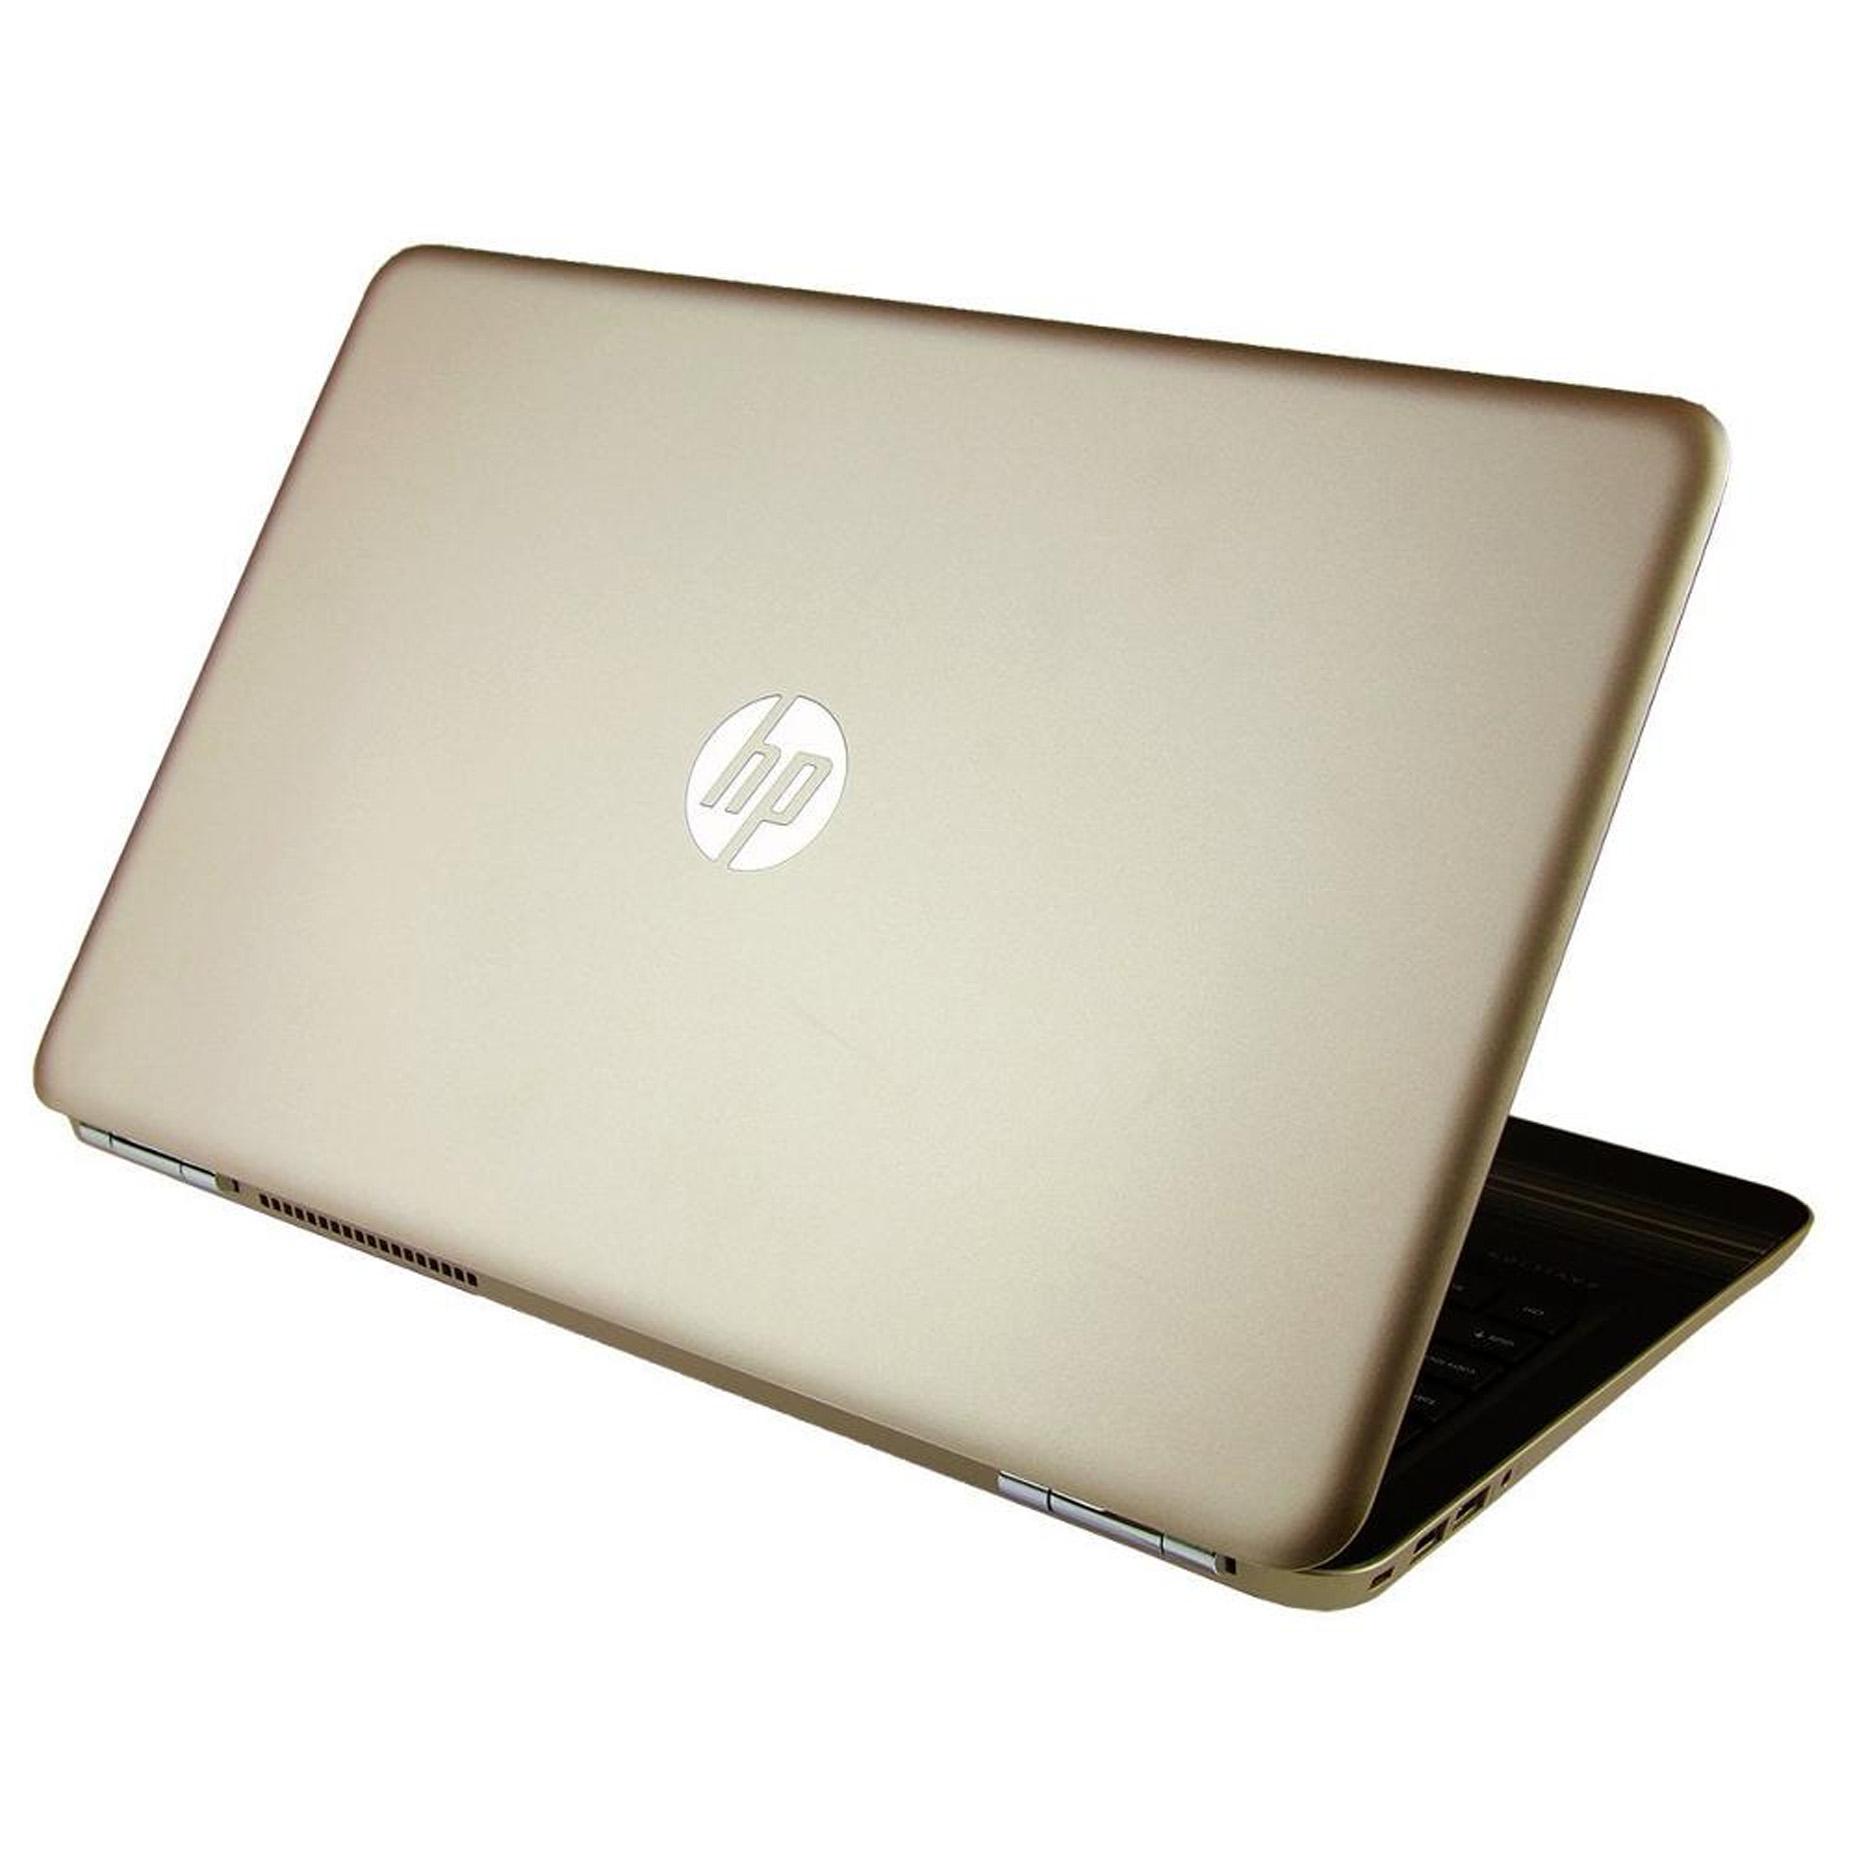 Katalog Produk Hp Laptop 14 Bw002ax Computer Notebook